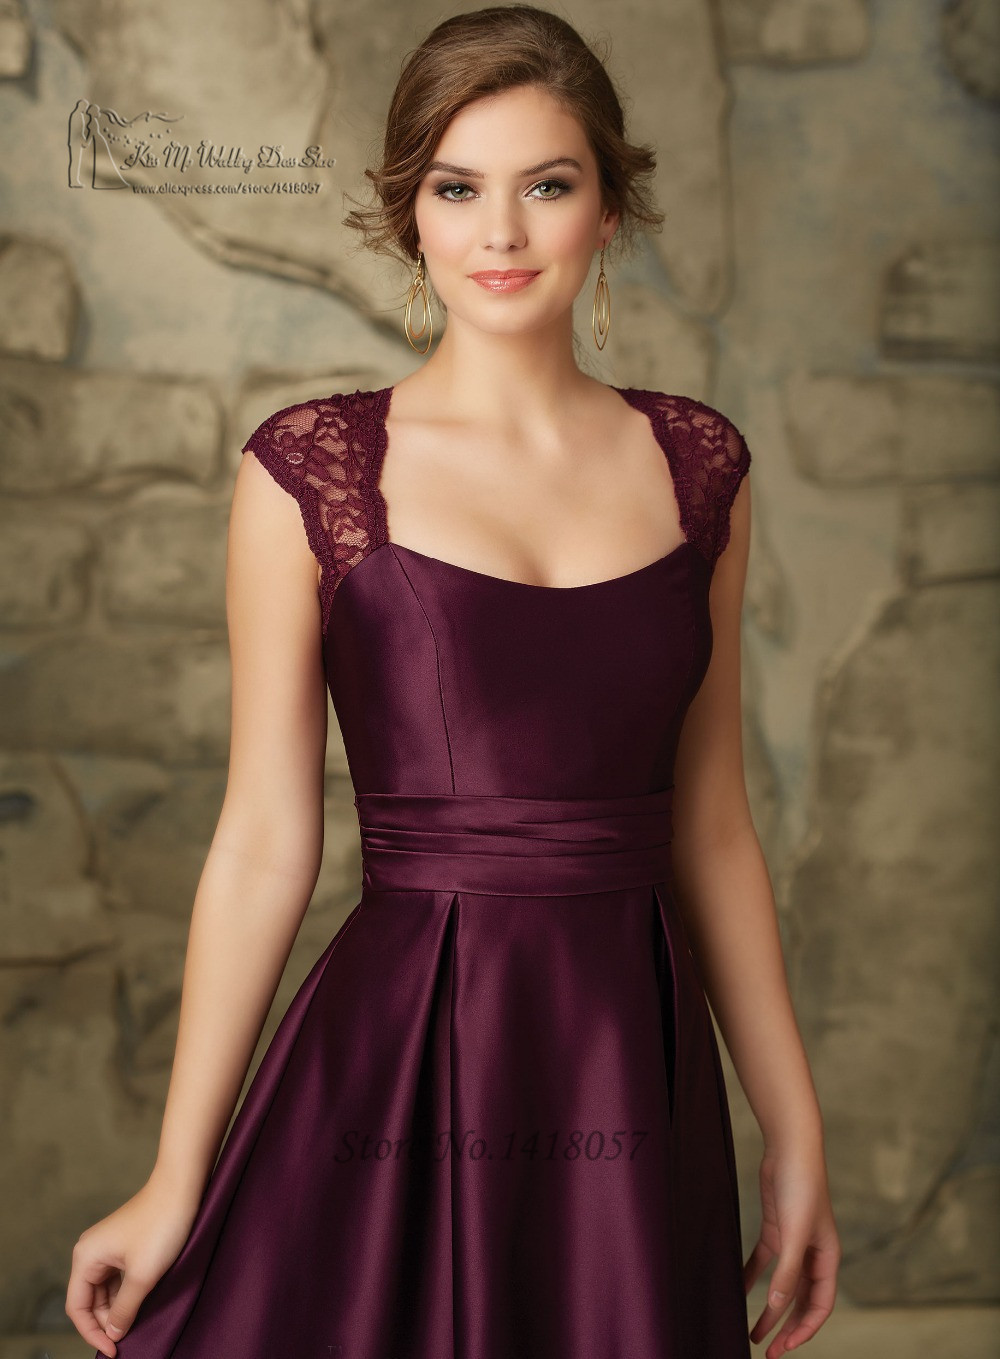 Buy bridesmaids dresses vosoi places to buy bridesmaid dresses near me u2013 your wedding memories photo ombrellifo Gallery